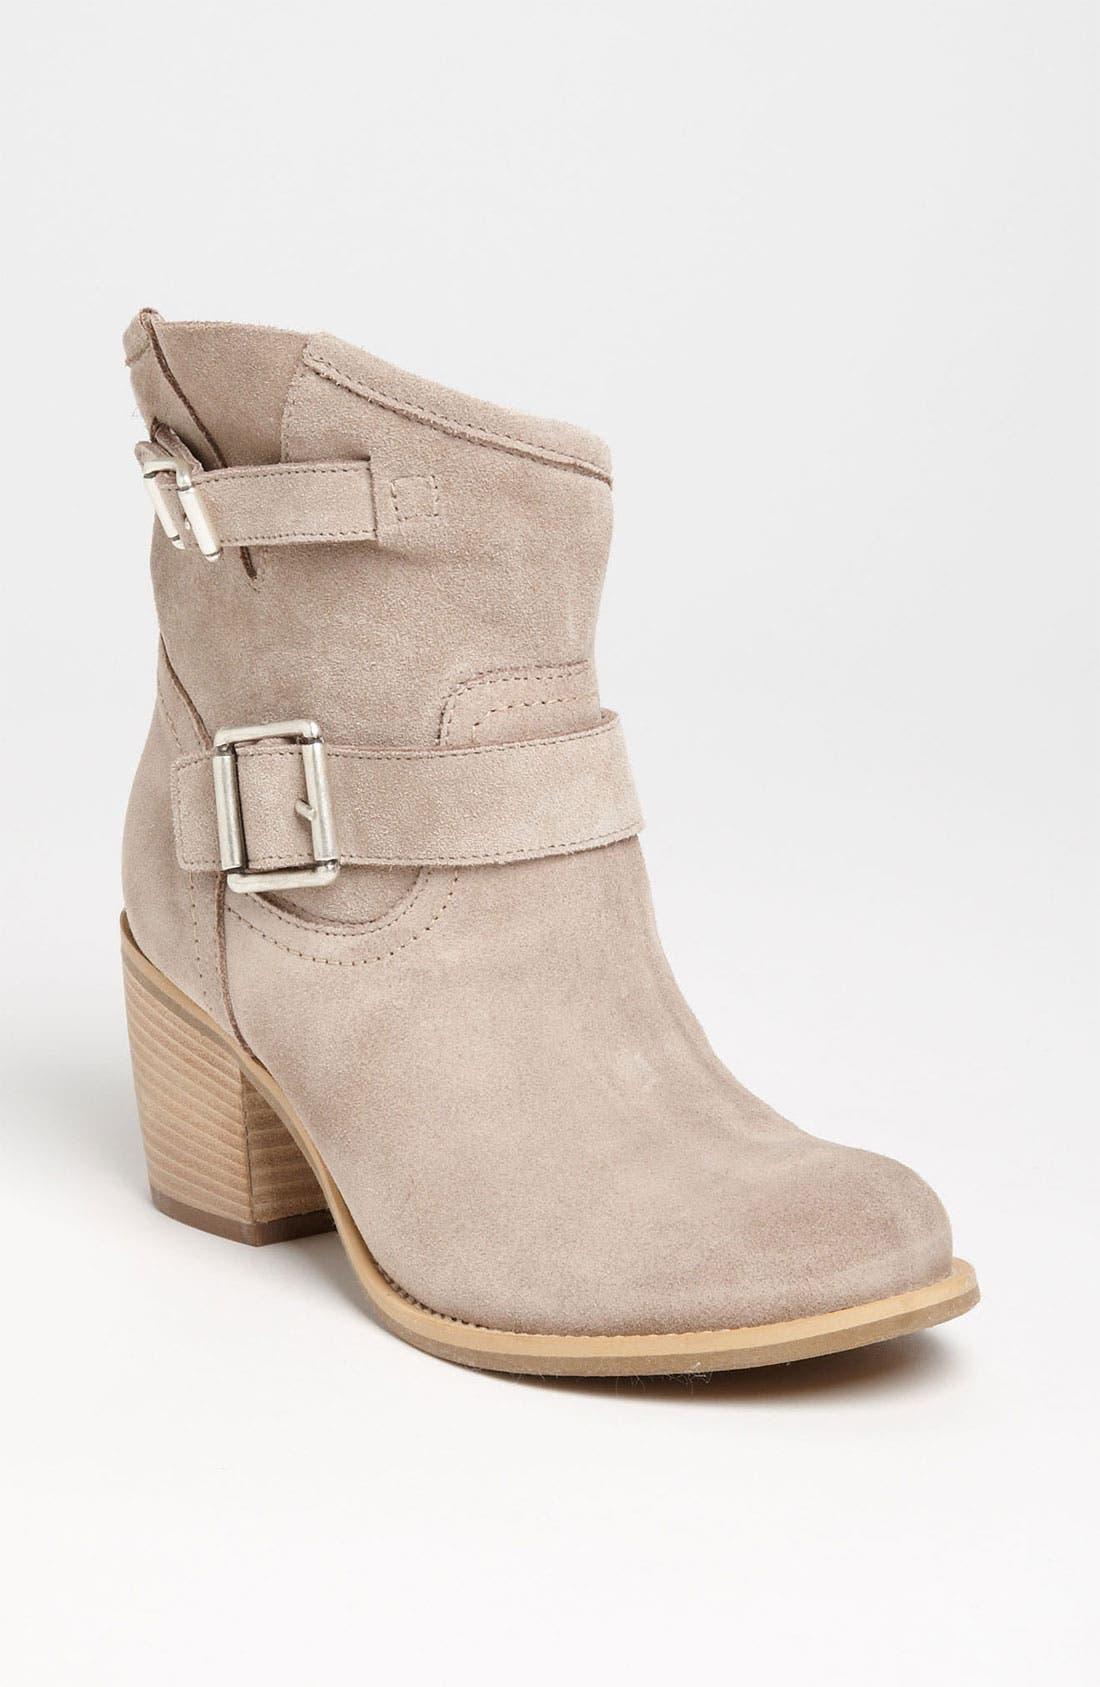 Alternate Image 1 Selected - Cordani 'Pompano' Boot